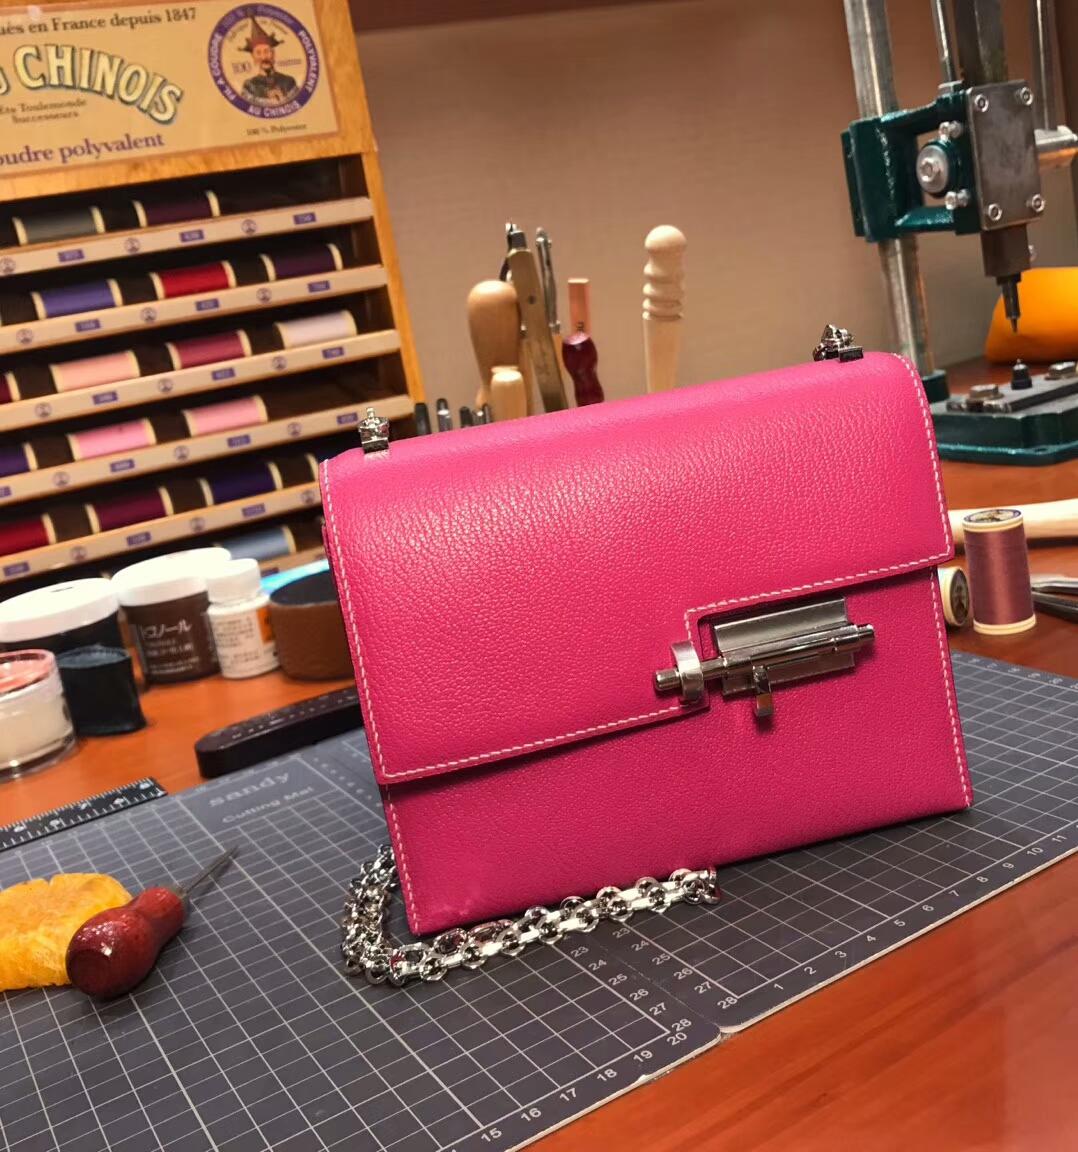 HERMES 爱马仕 手枪包 Verrou Chain Rose Tyrien 糖果粉 E5 玫红色 桃红色 配全套专柜原版包装